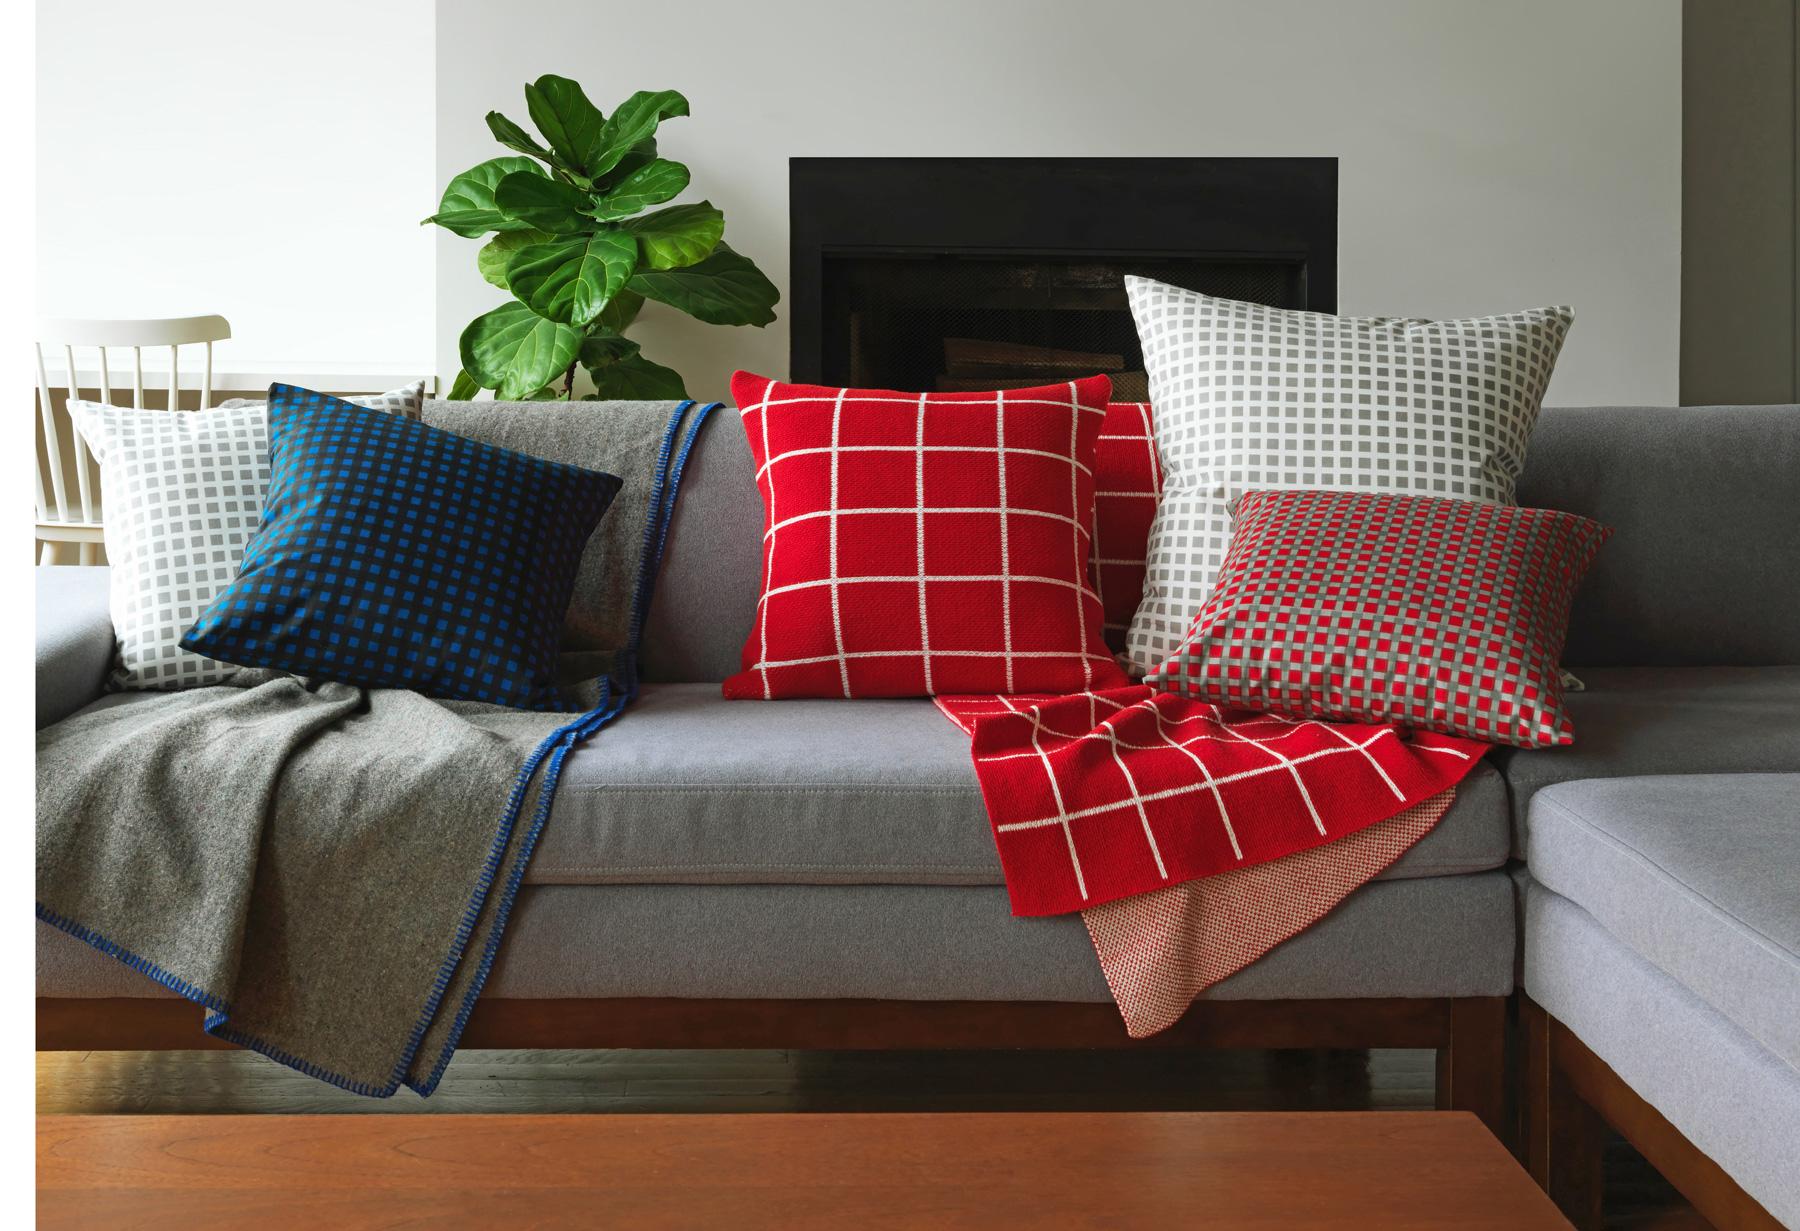 sofa_pillows_0323_RESIZED.jpg